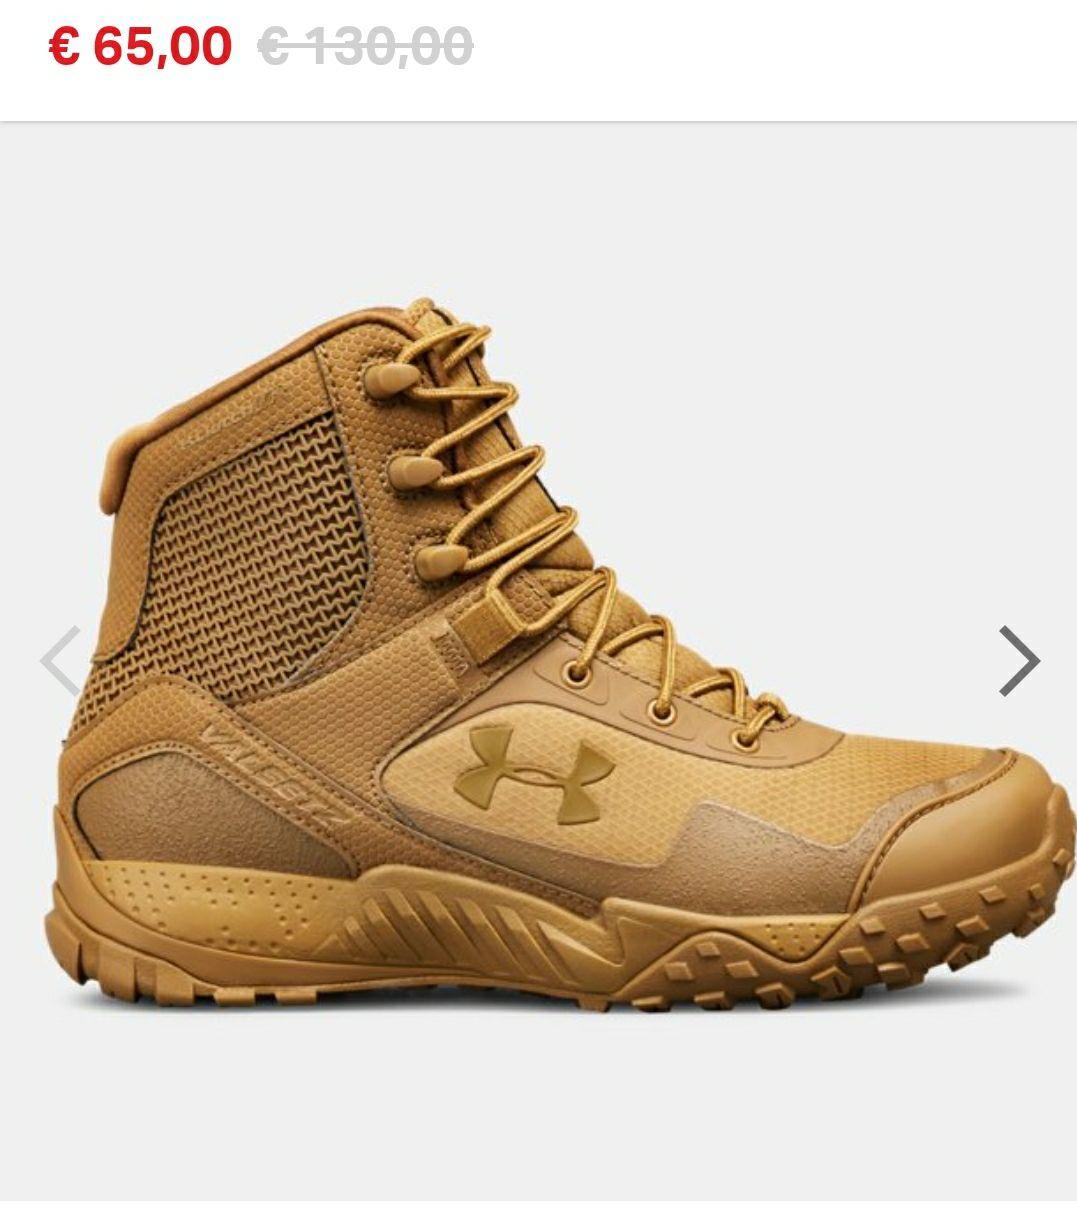 Chaussures militaires femme UA Valsetz RTS 1.5